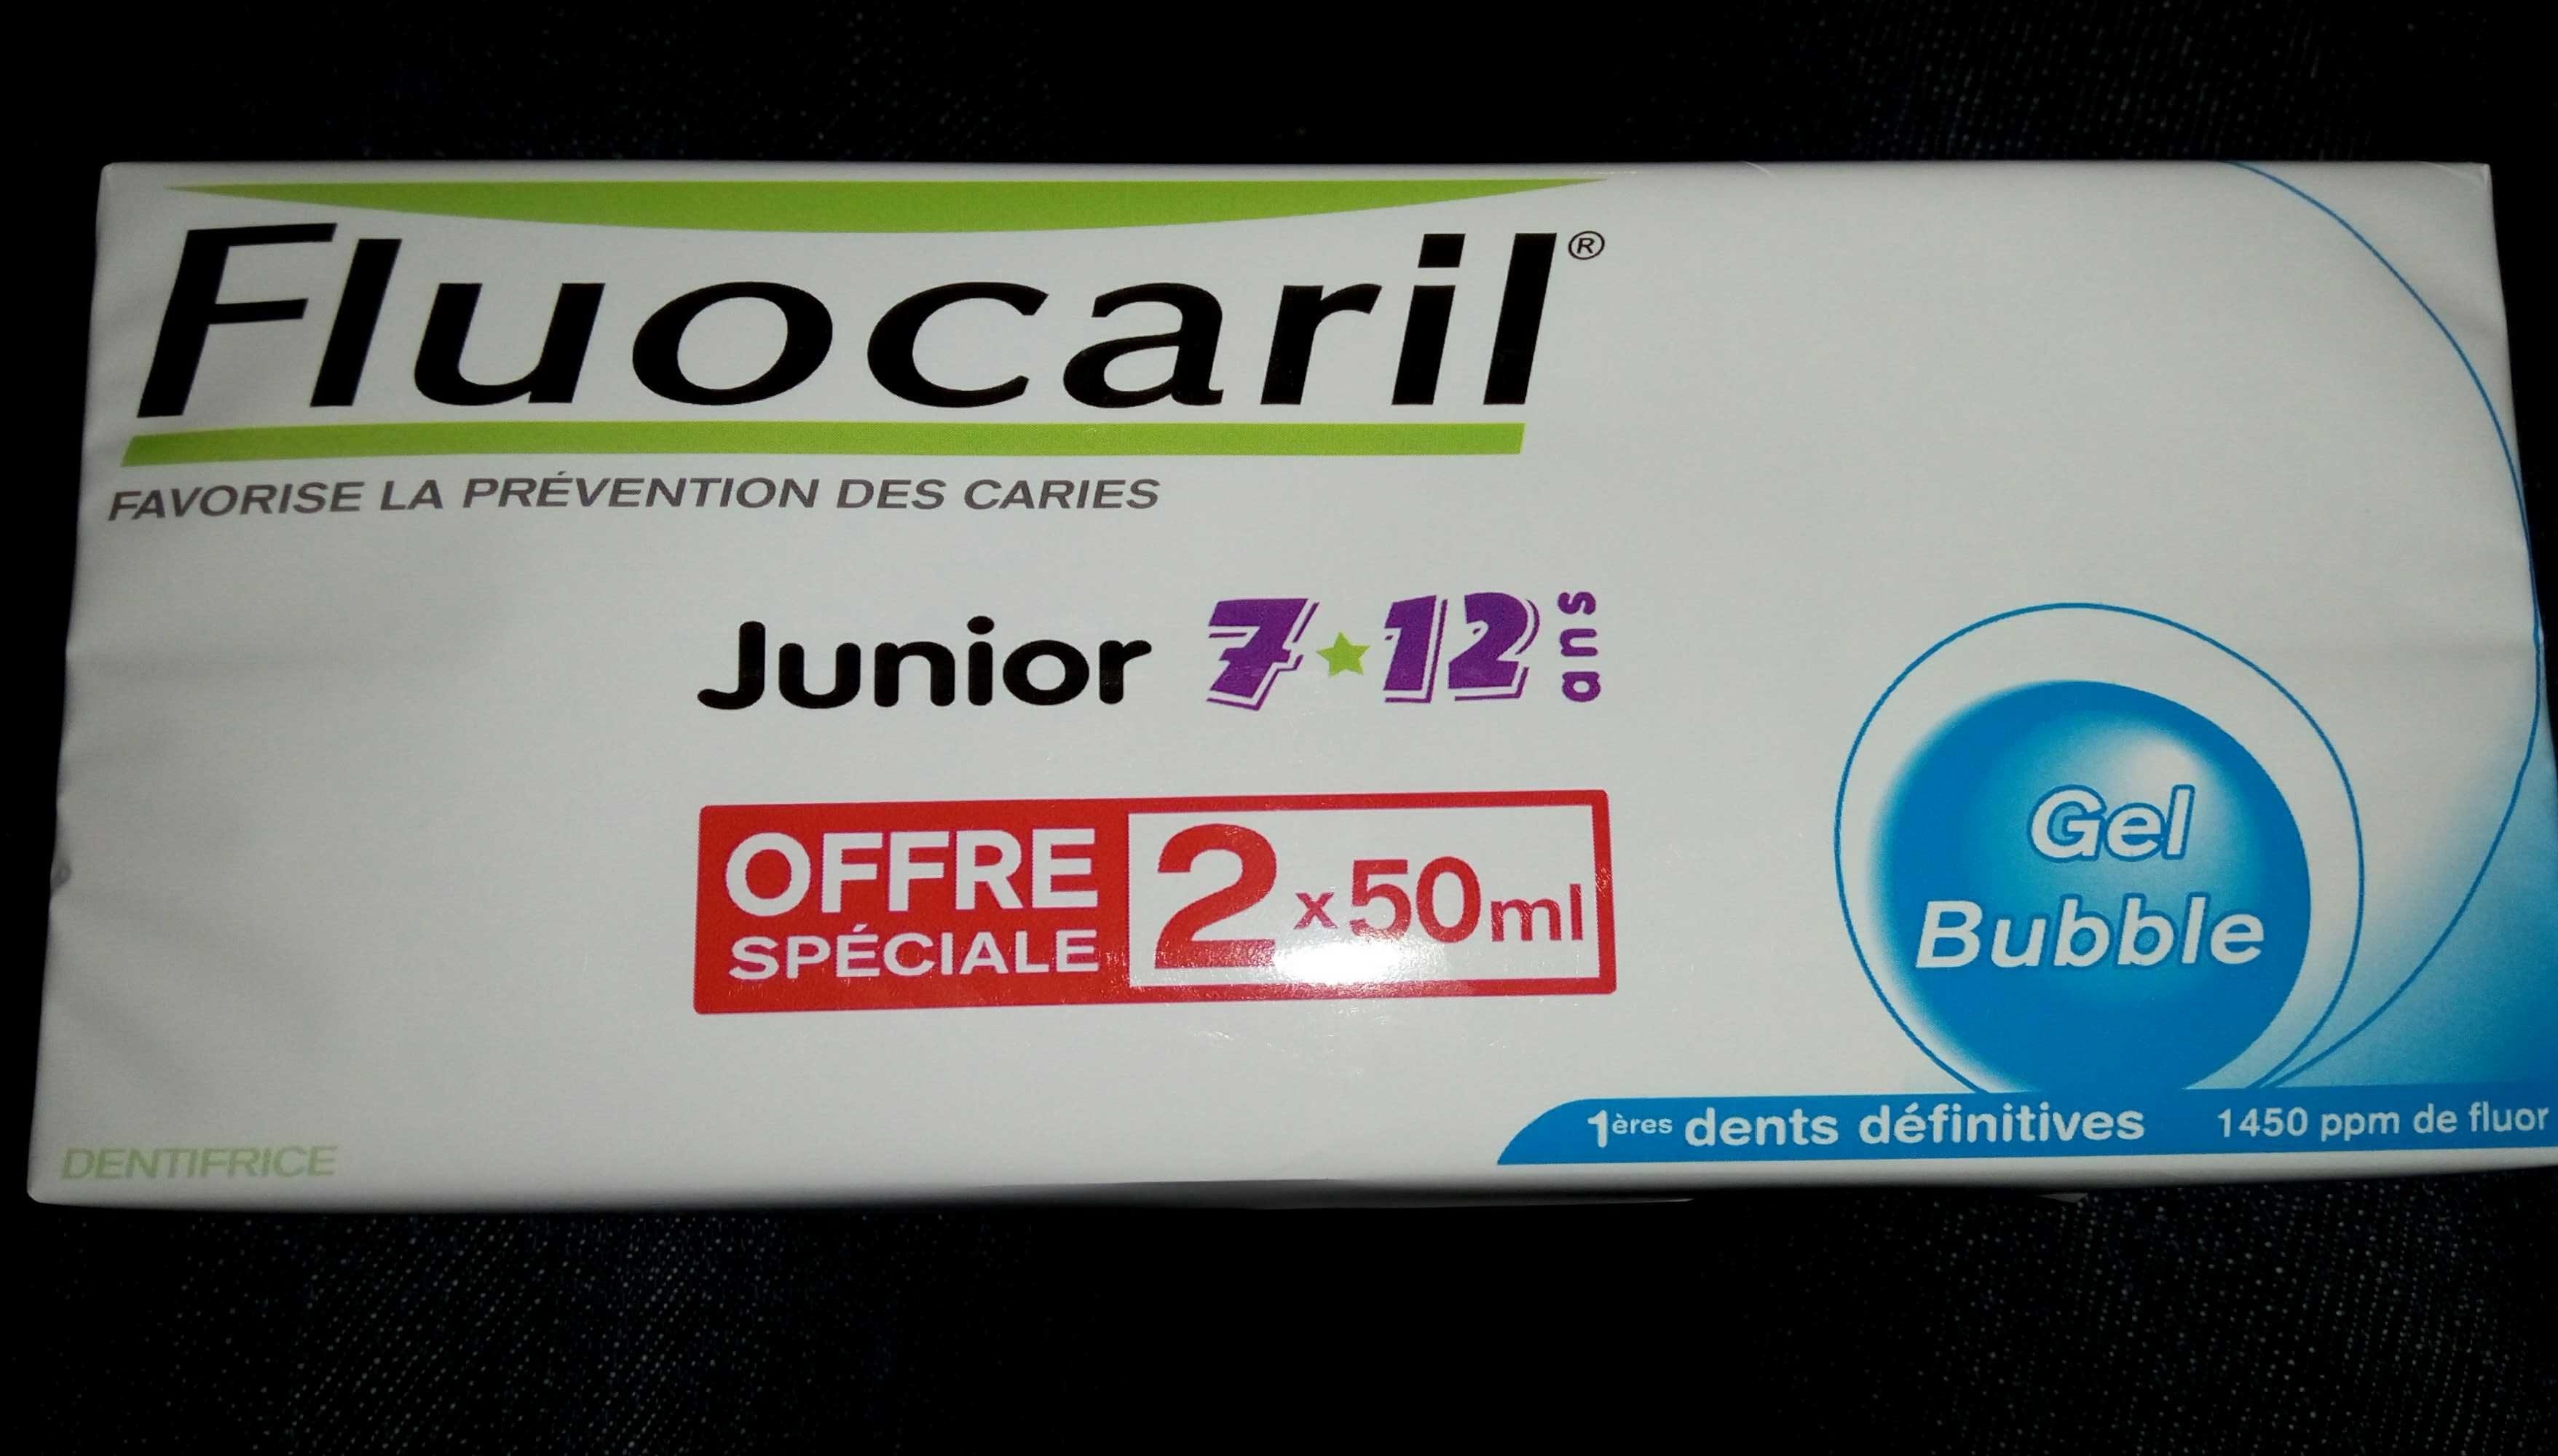 Fluocaril Junior 7-12 ans - Product - fr